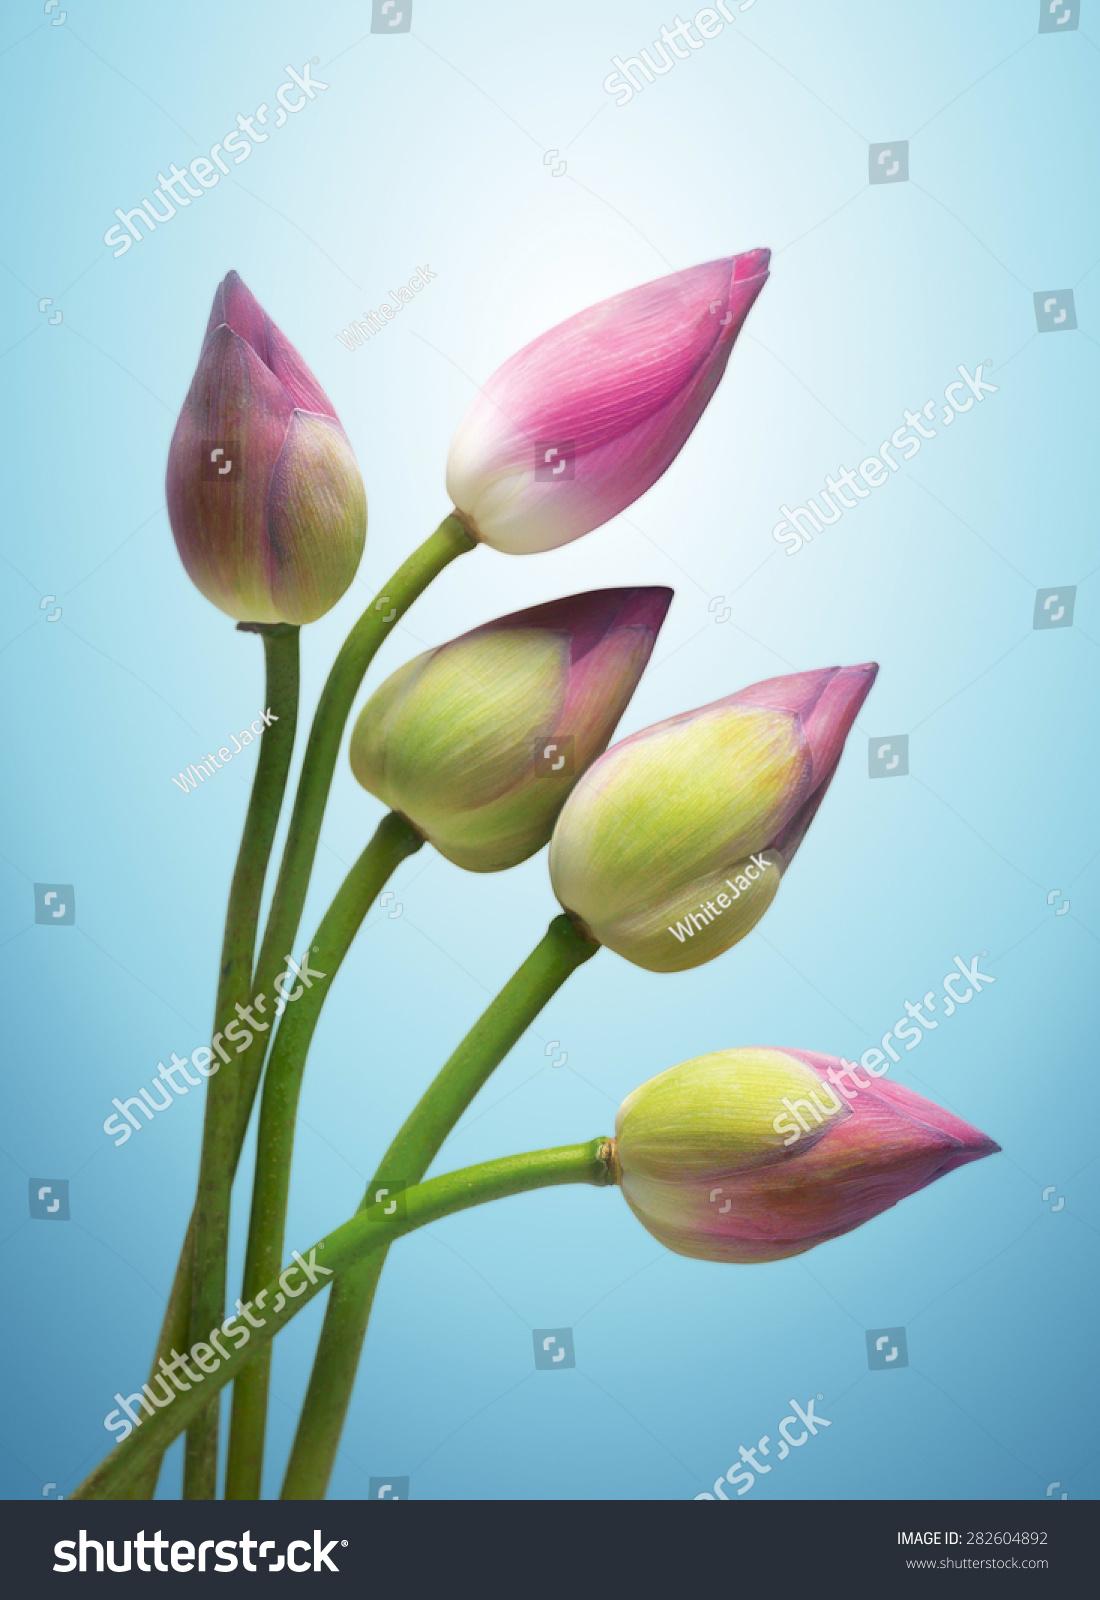 Lotus flower buds stock photo edit now 282604892 shutterstock lotus flower buds mightylinksfo